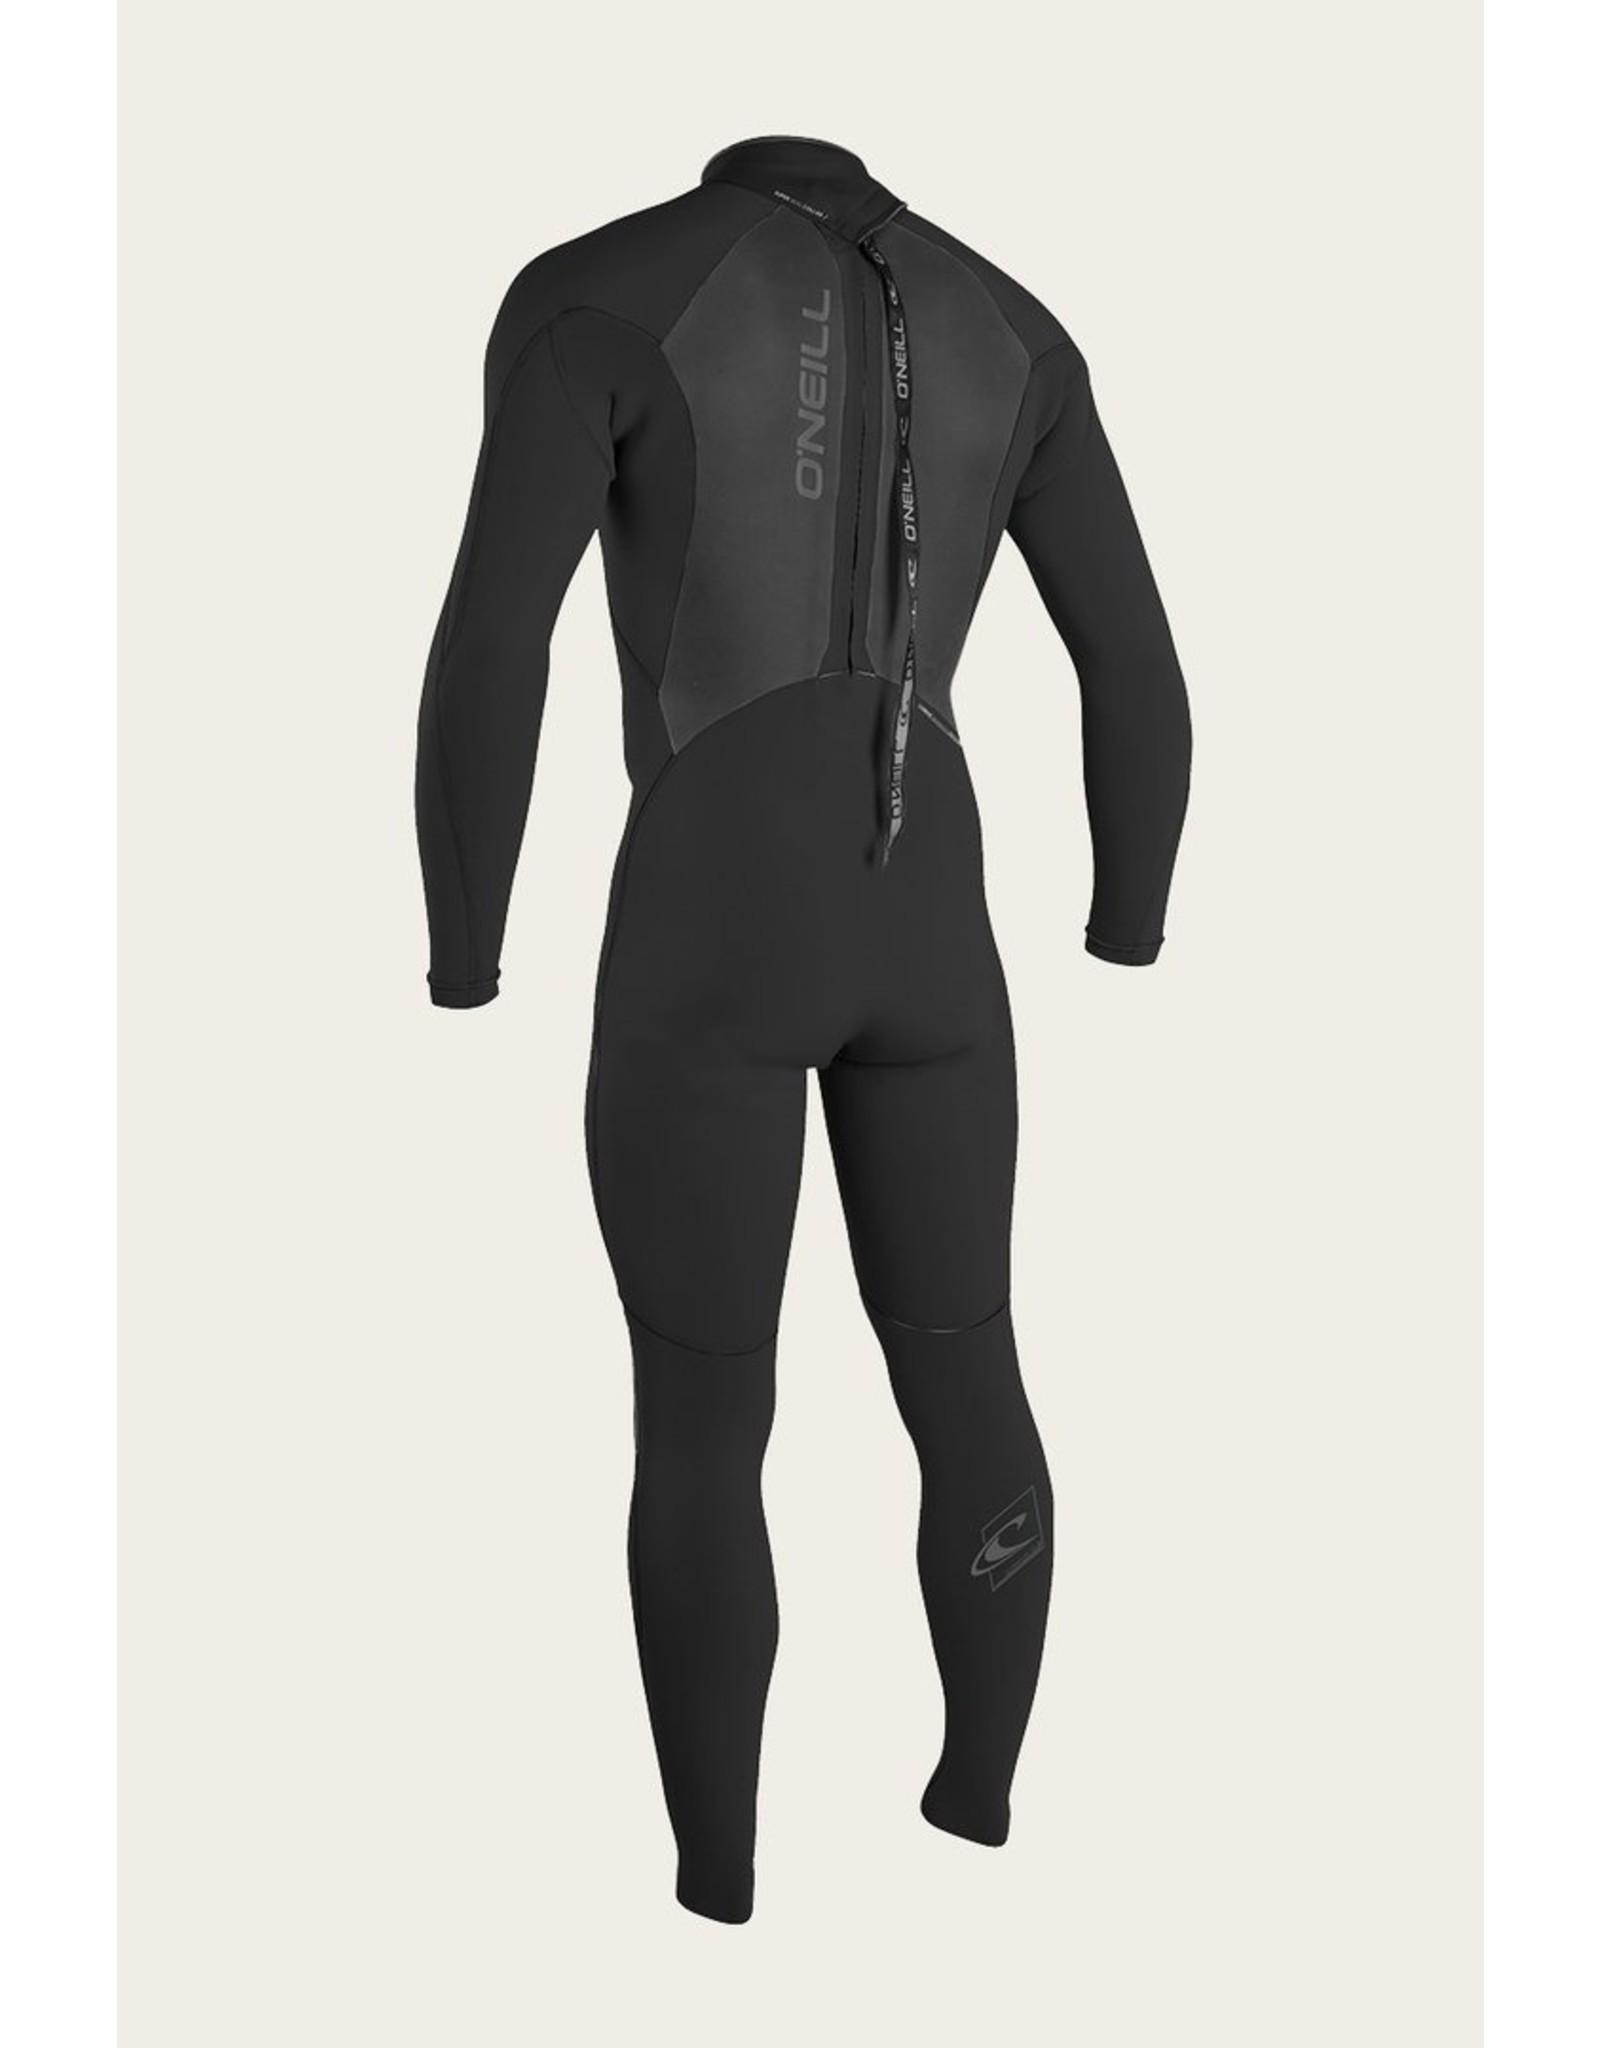 O'Neill Epic 4/3 Full Wetsuit Black